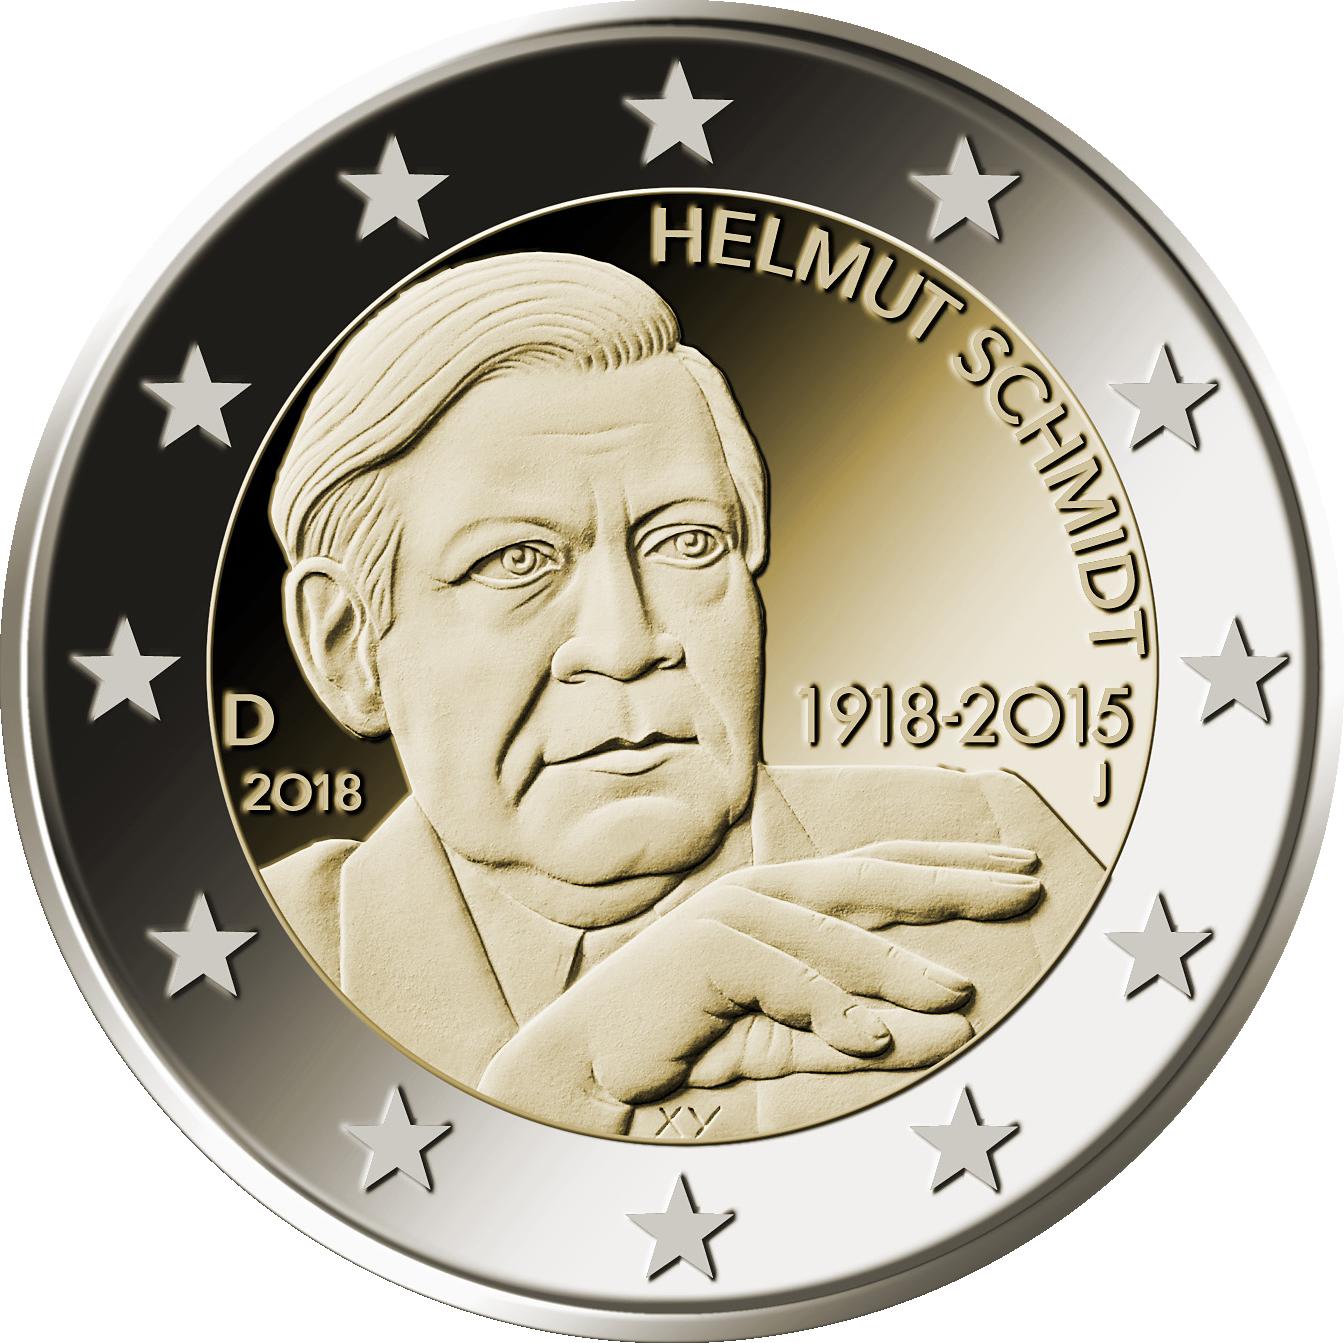 2 Euro Münze 2018 Helmut Schmidt Mdm Deutsche Münze